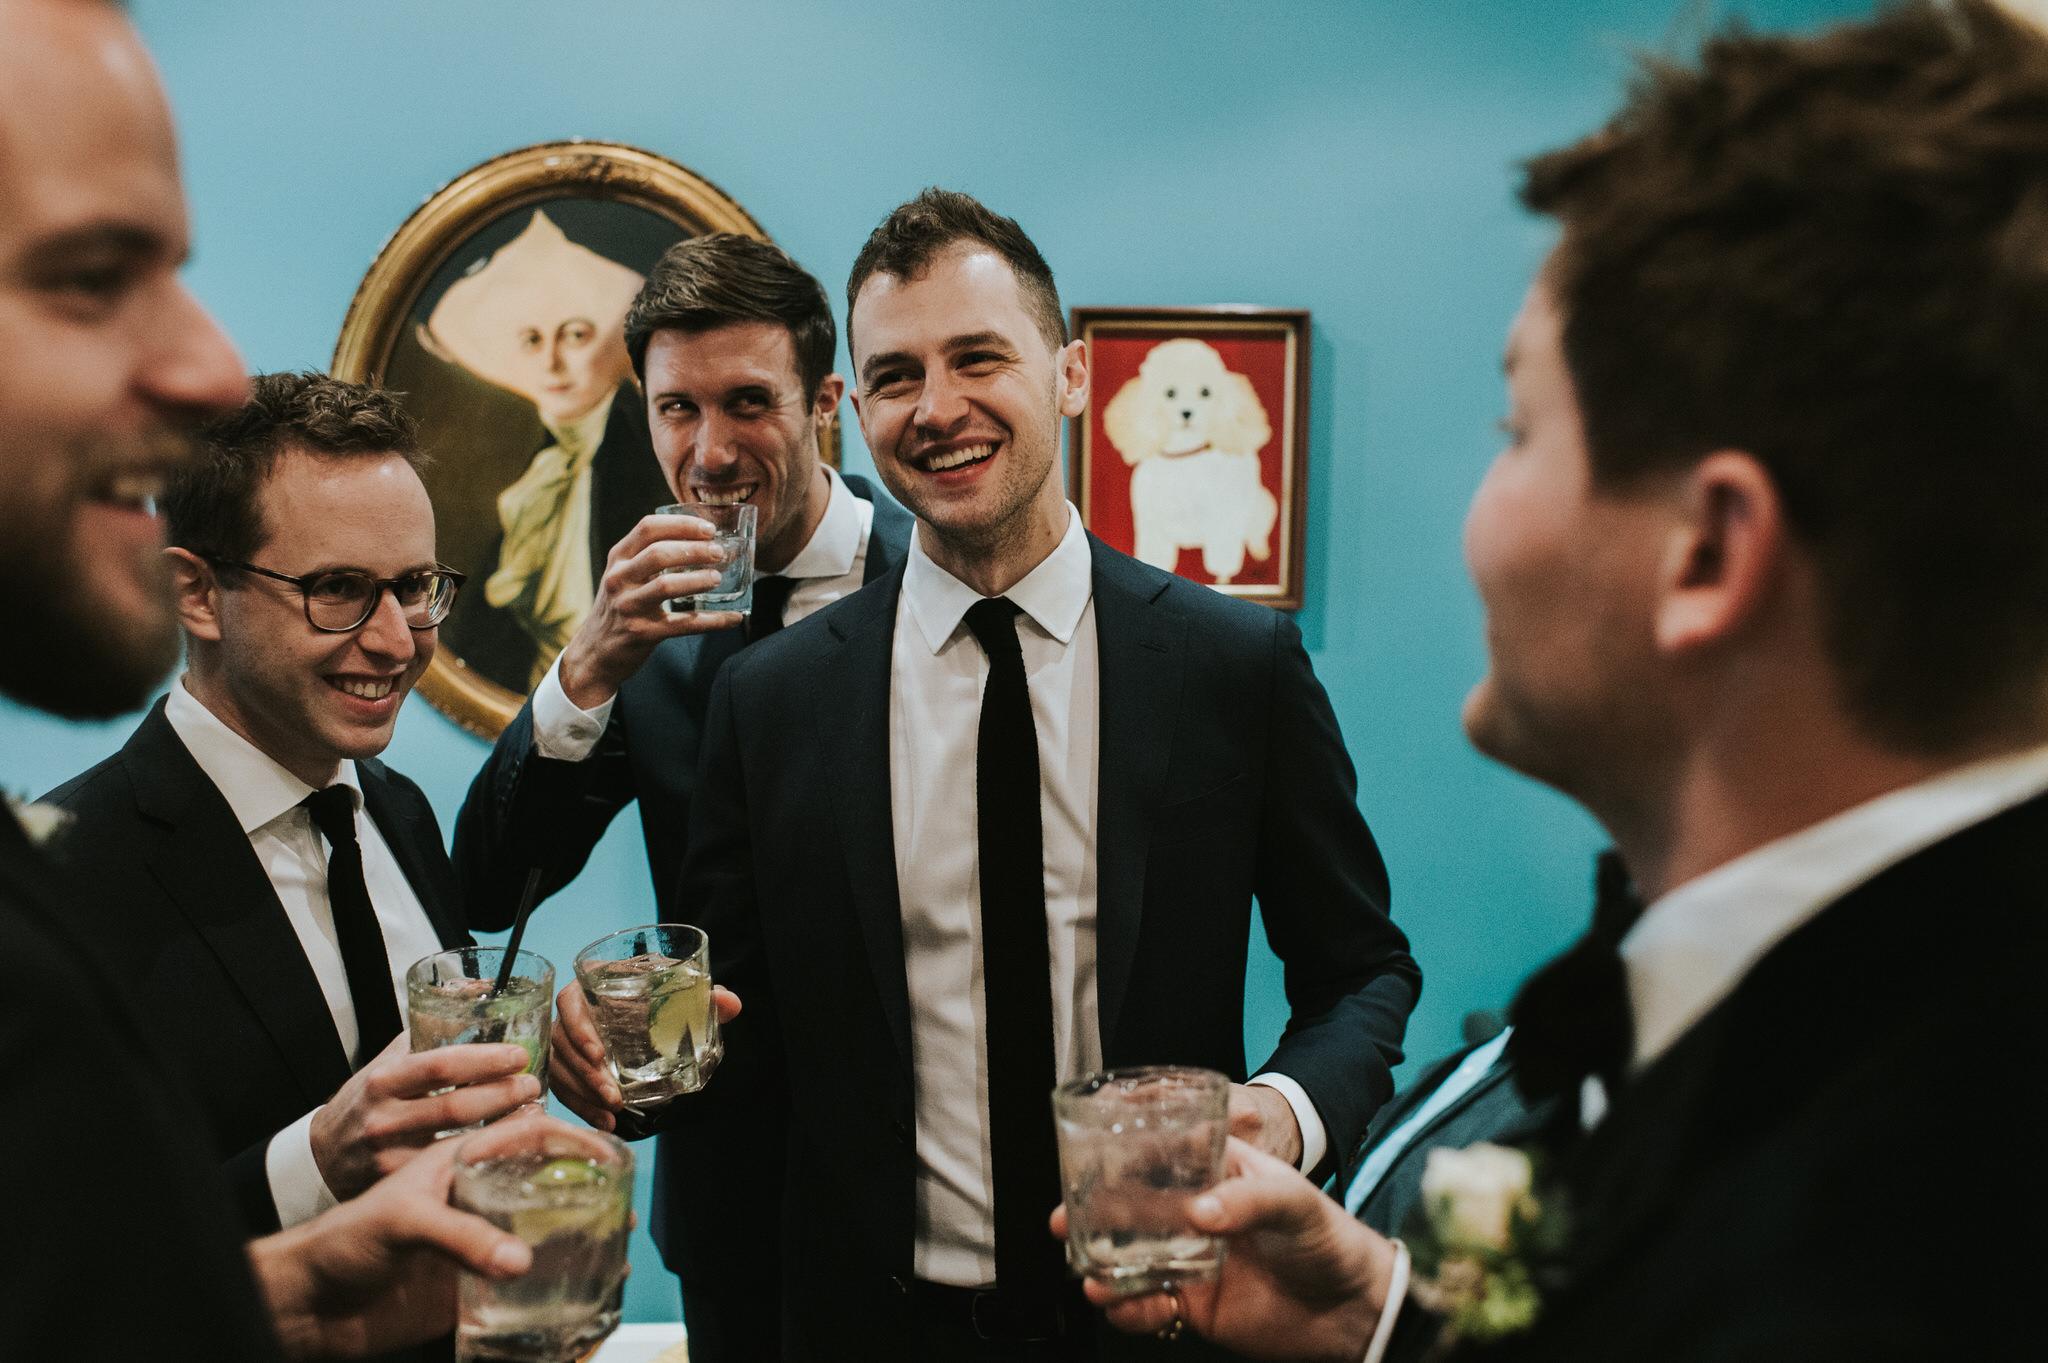 scarletoneillphotography_weddingphotography_prince edward county weddings013.JPG